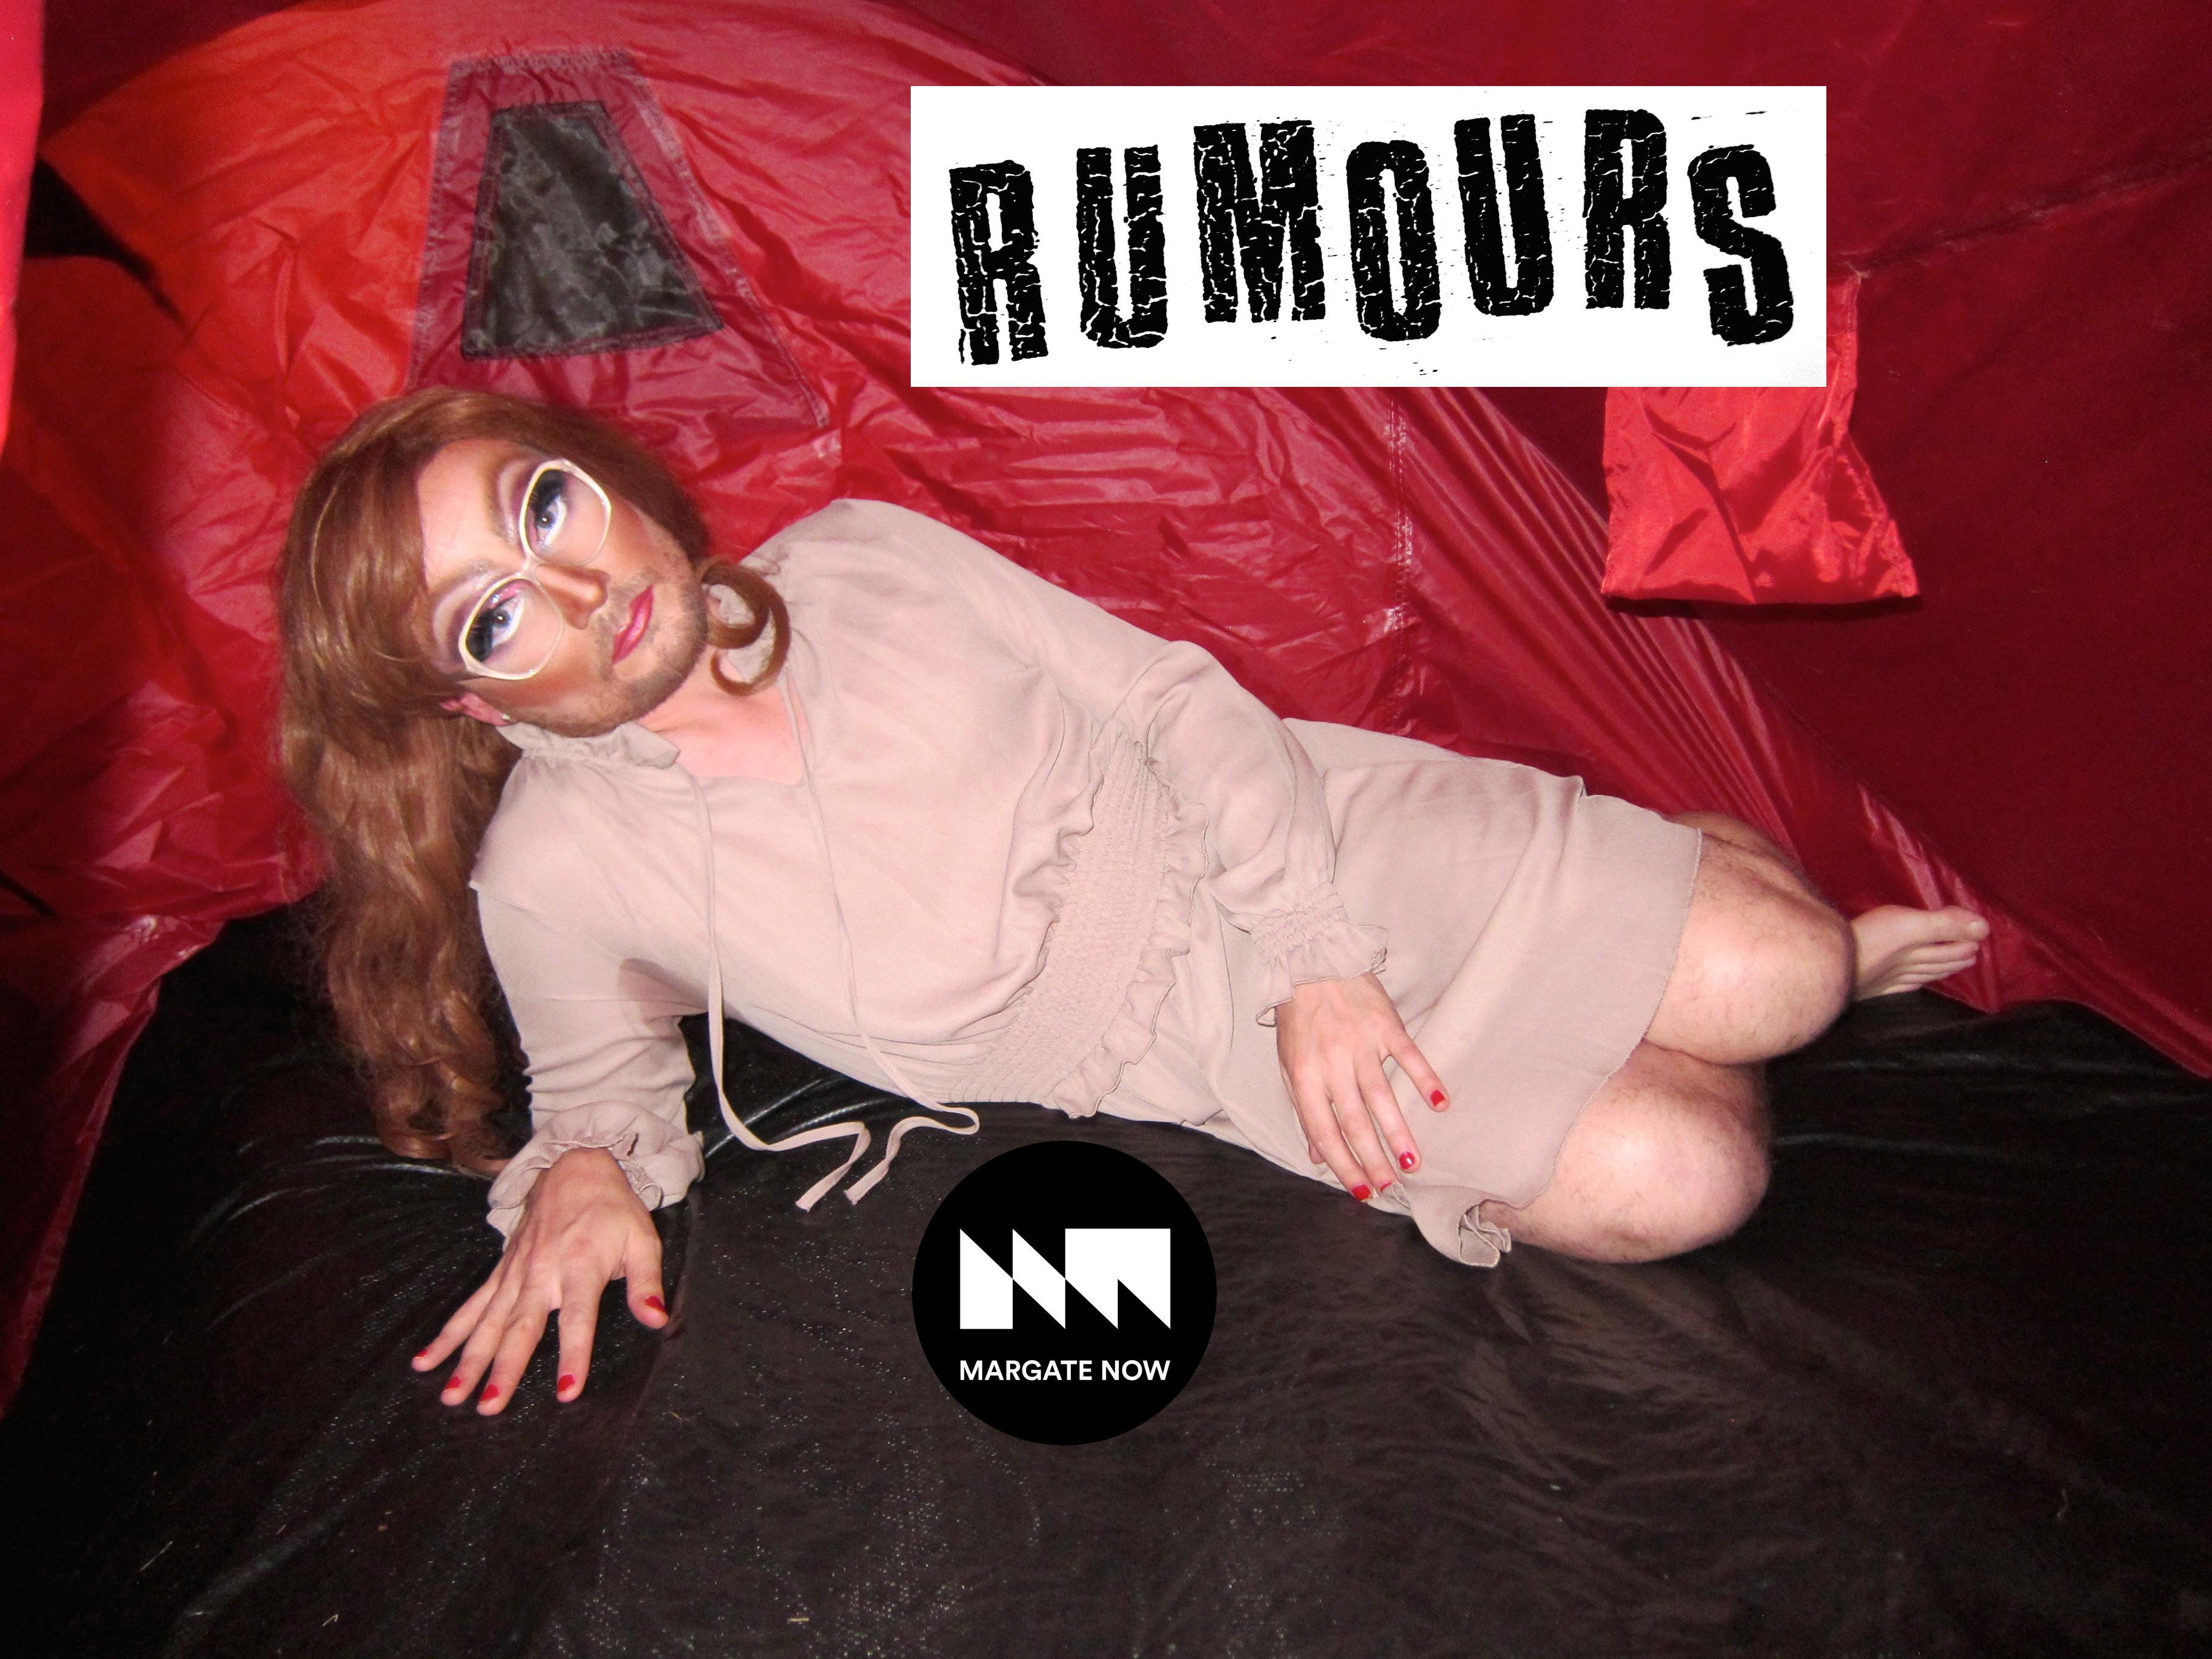 Rumours Event 1 28 Sept_Bob Chicalors_image Liam ODriscoll_Margate NOW festival 2019